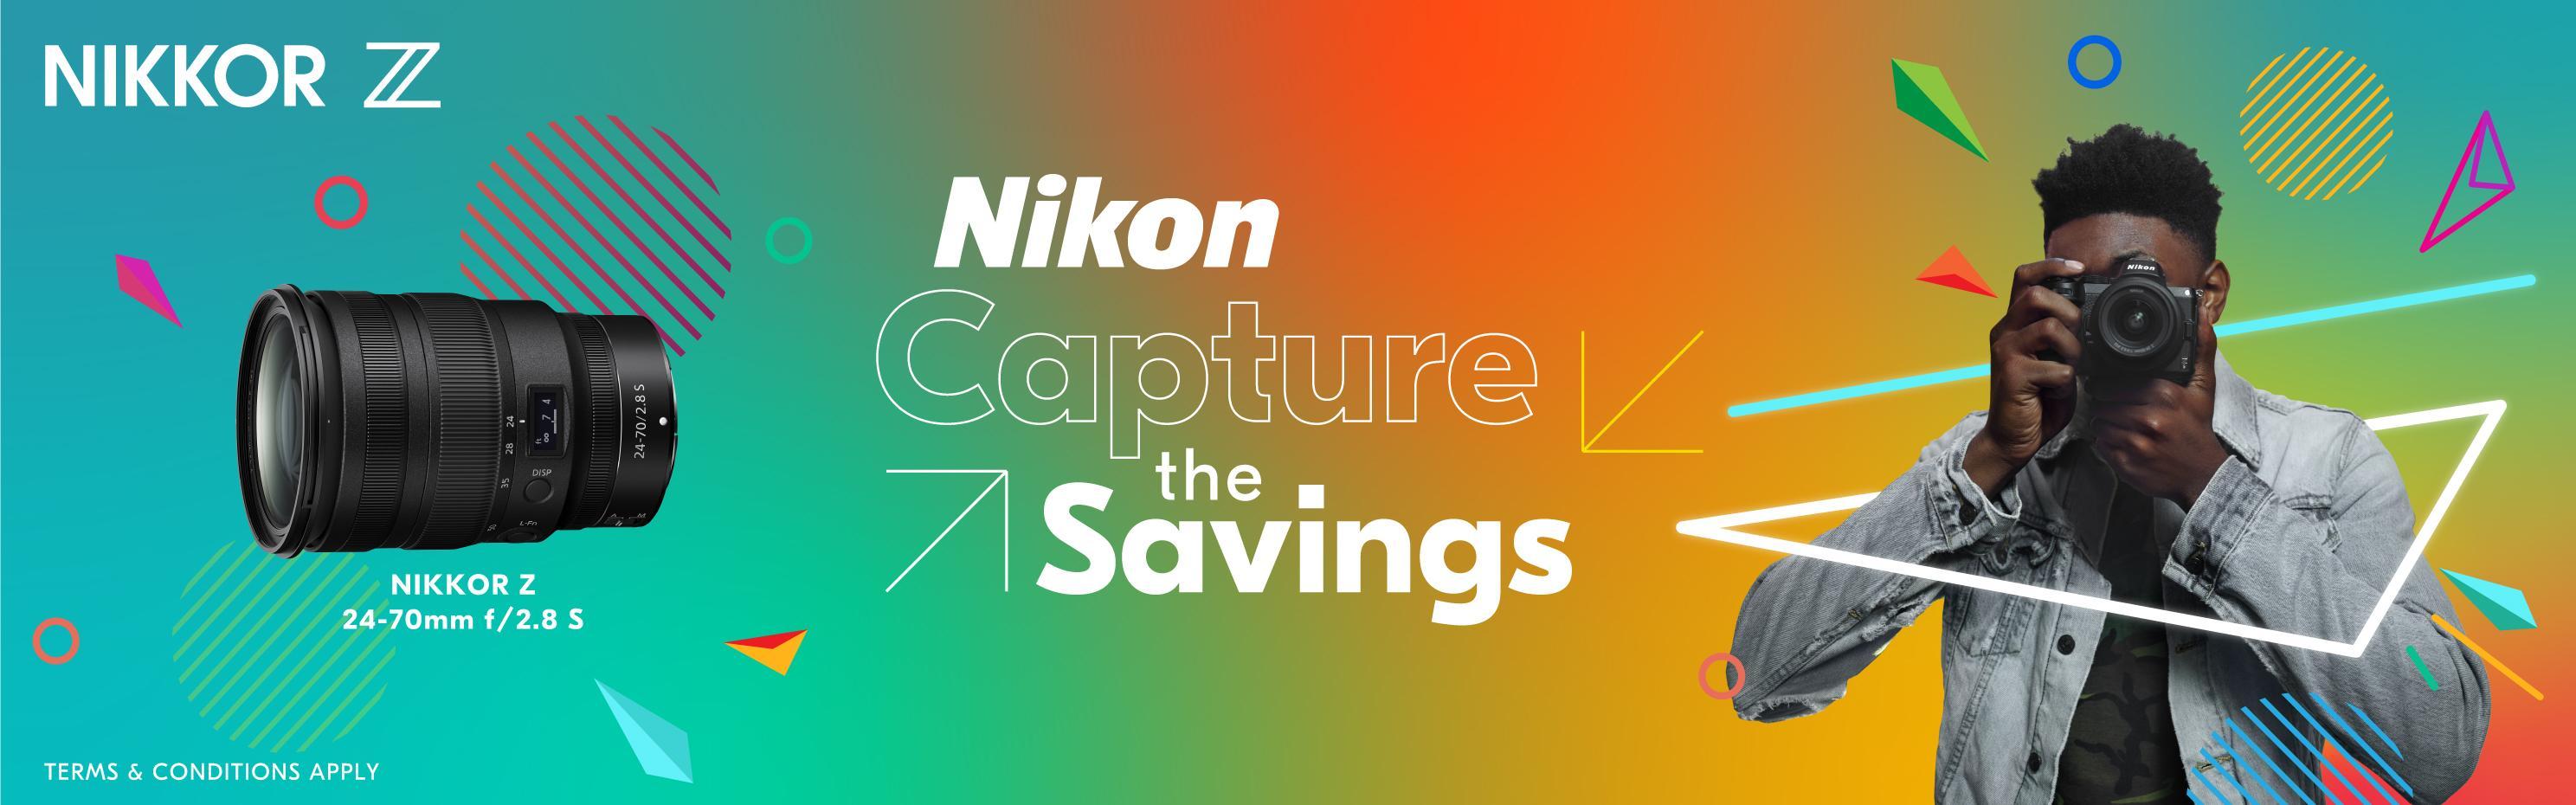 Nikon-EasterPromo-CameralandSandton-Zlens